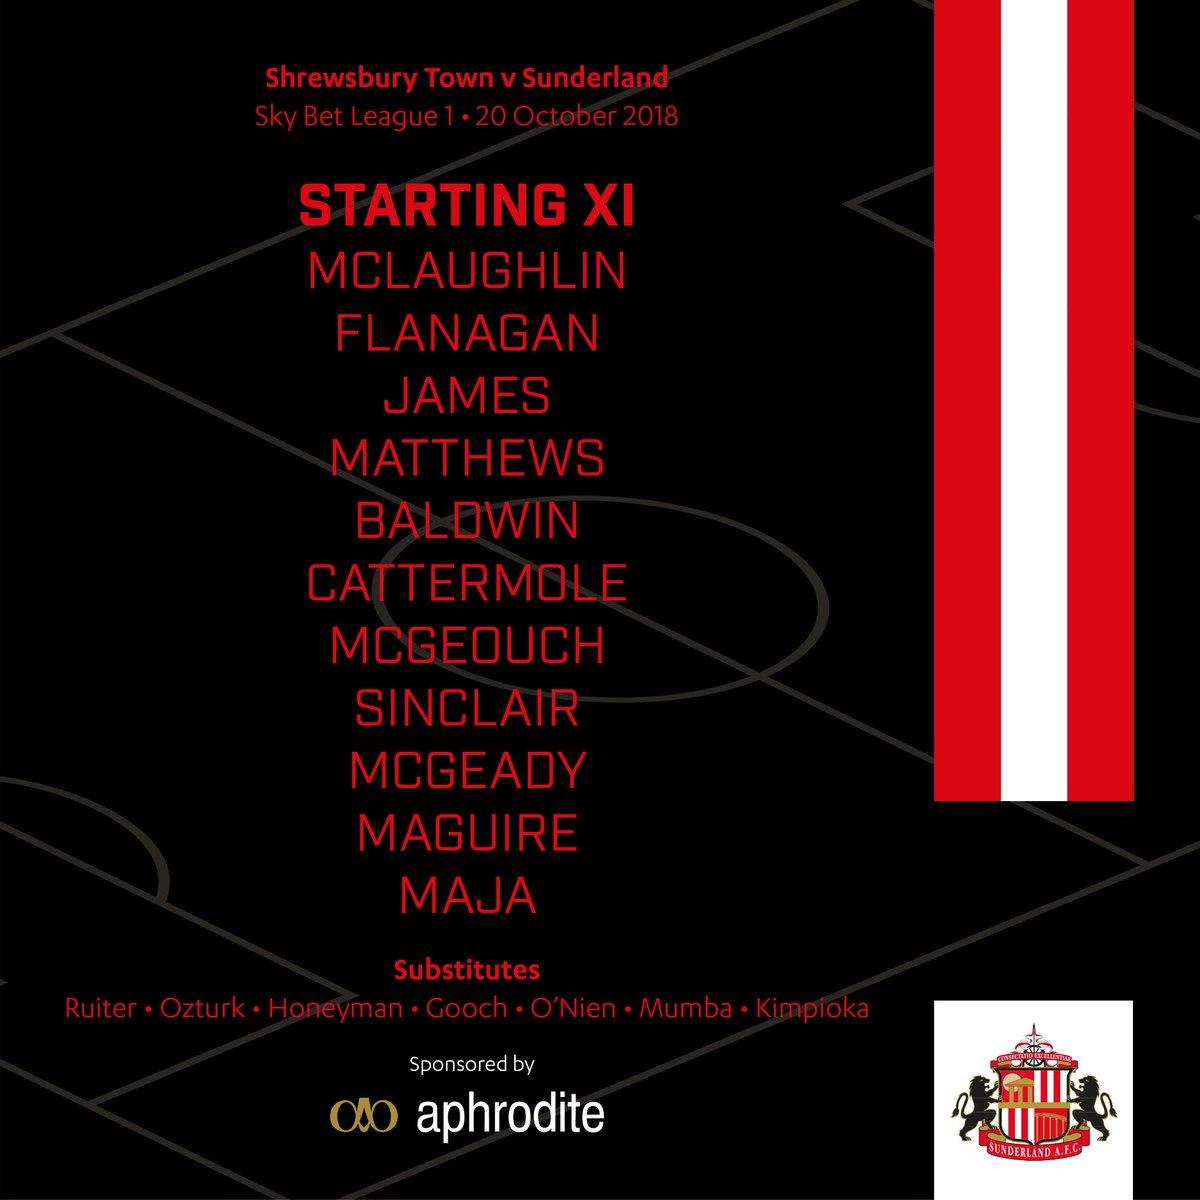 Shrewsbury Town v Sunderland AFC Dp8_cywX4AEJqha